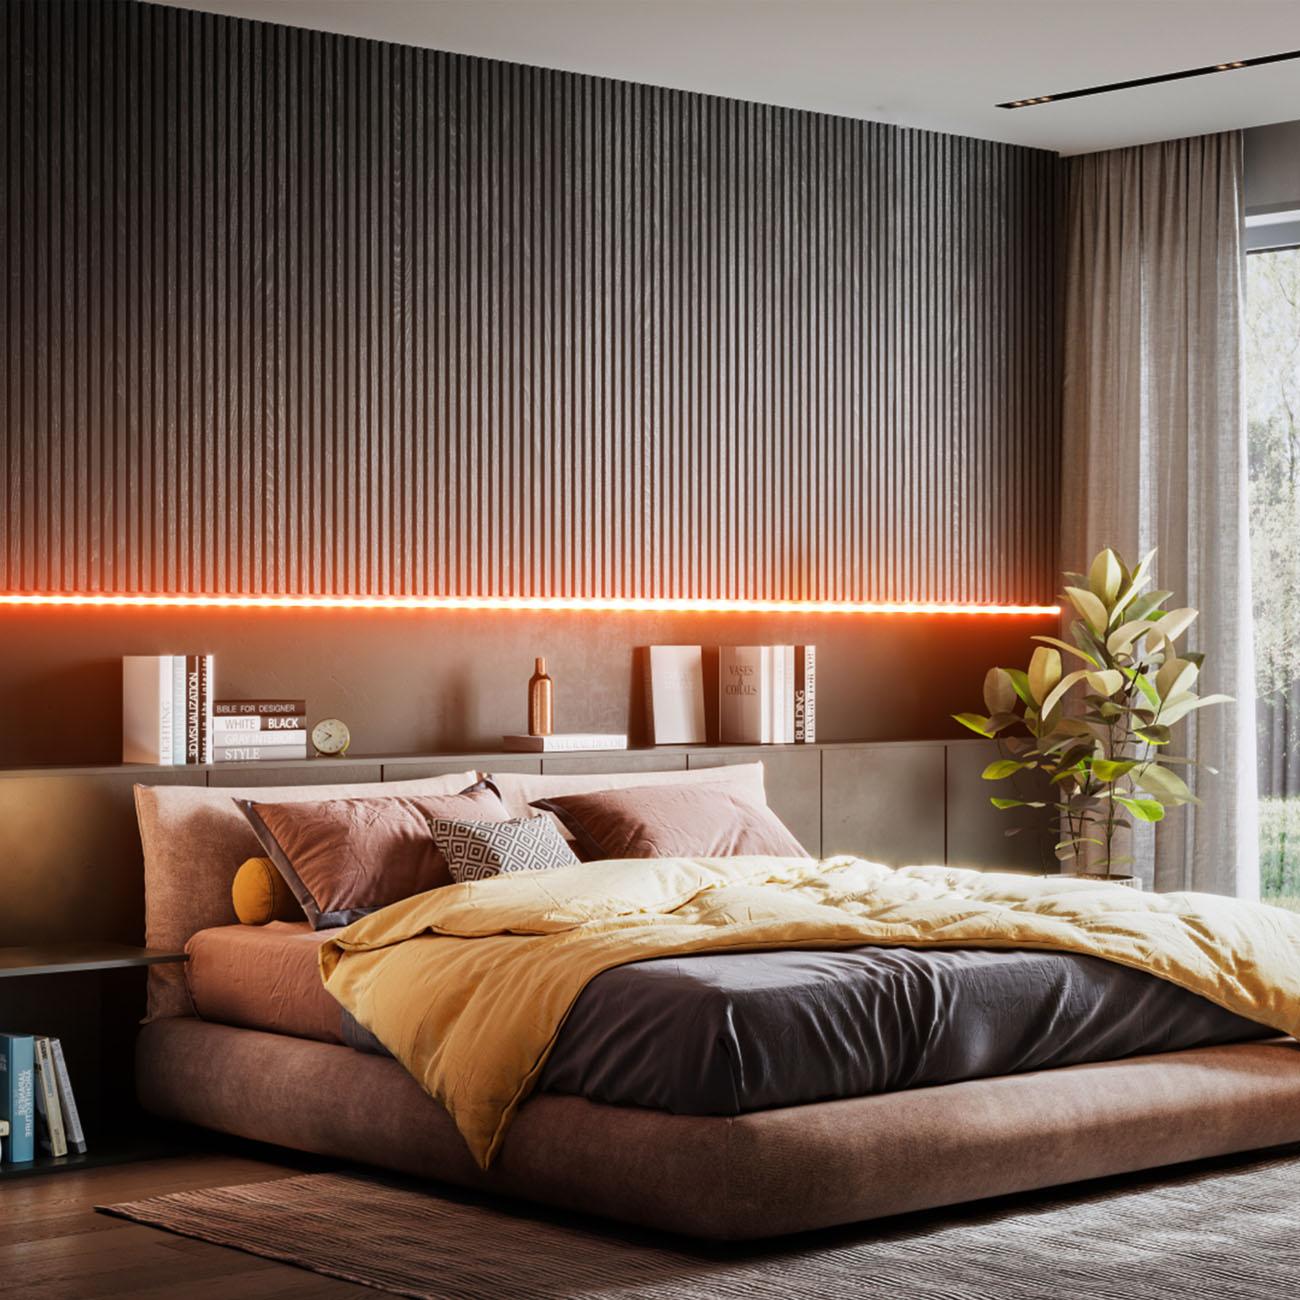 RGB LED Streifen mit Farbwechsel 3m - 4